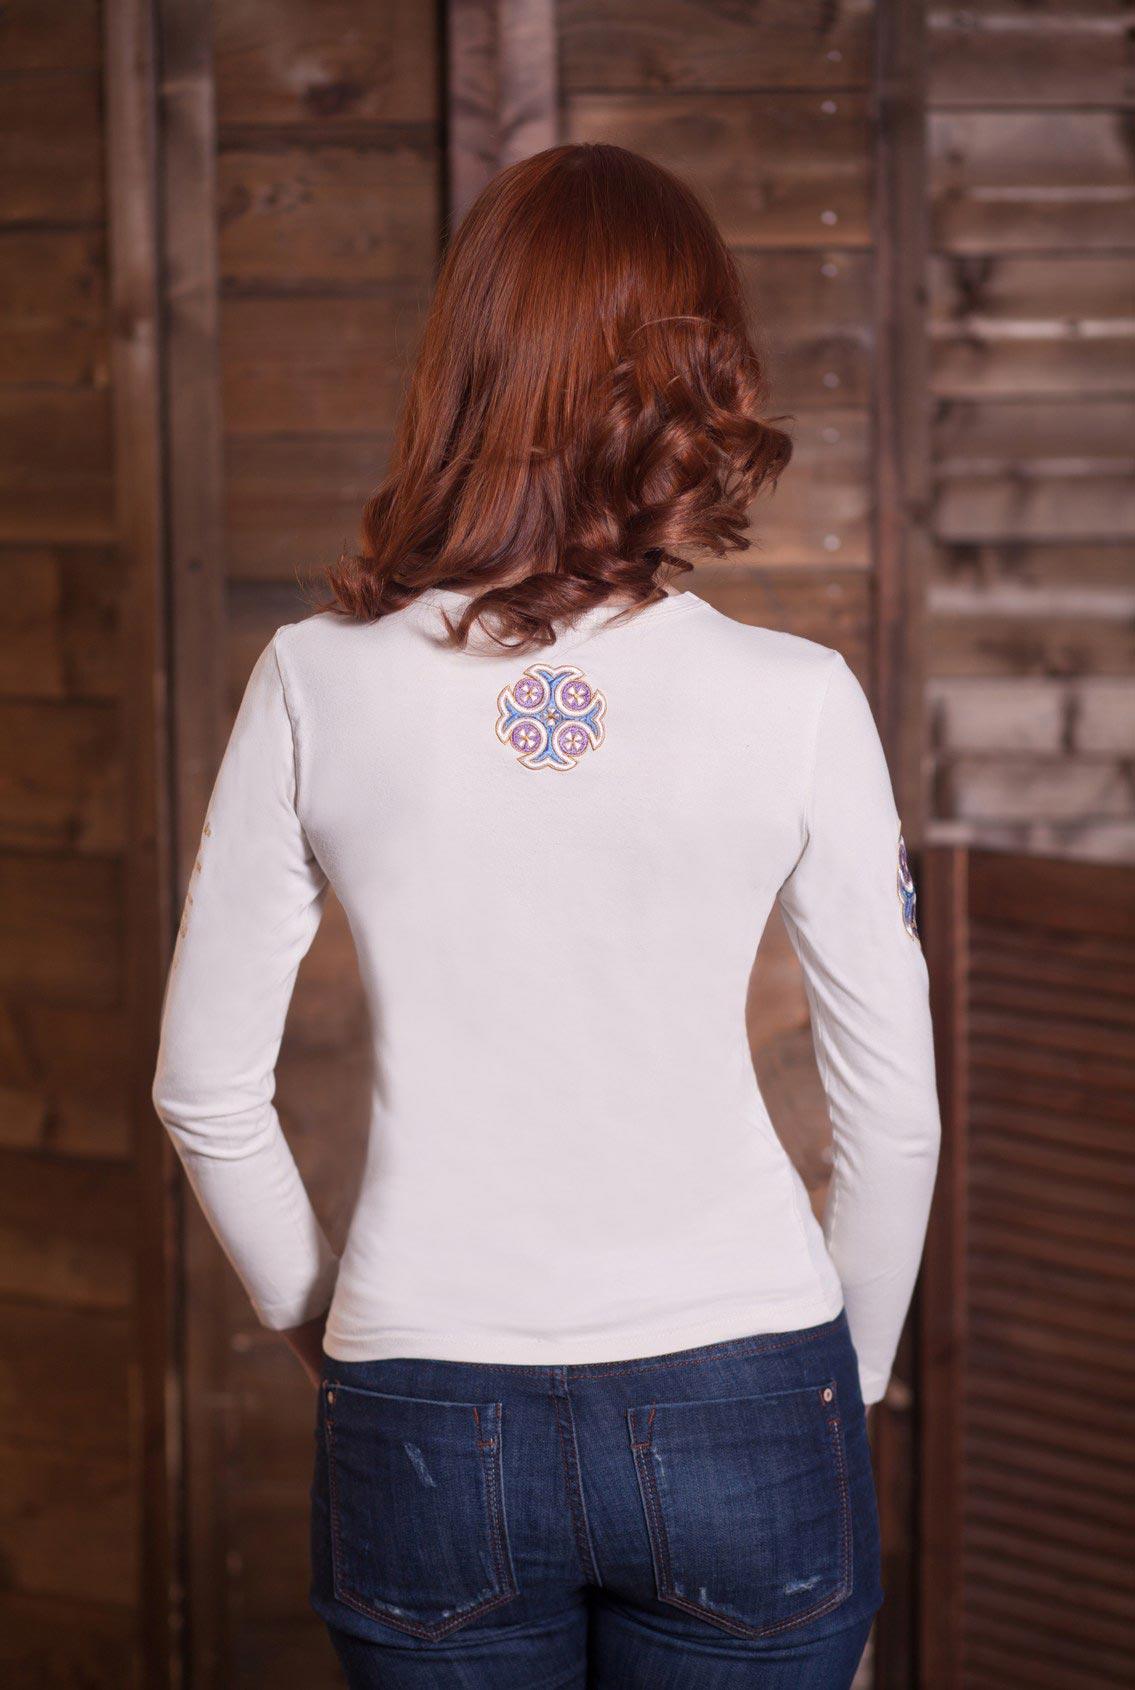 женская футболка с крестом, women's t-shirt with a cross